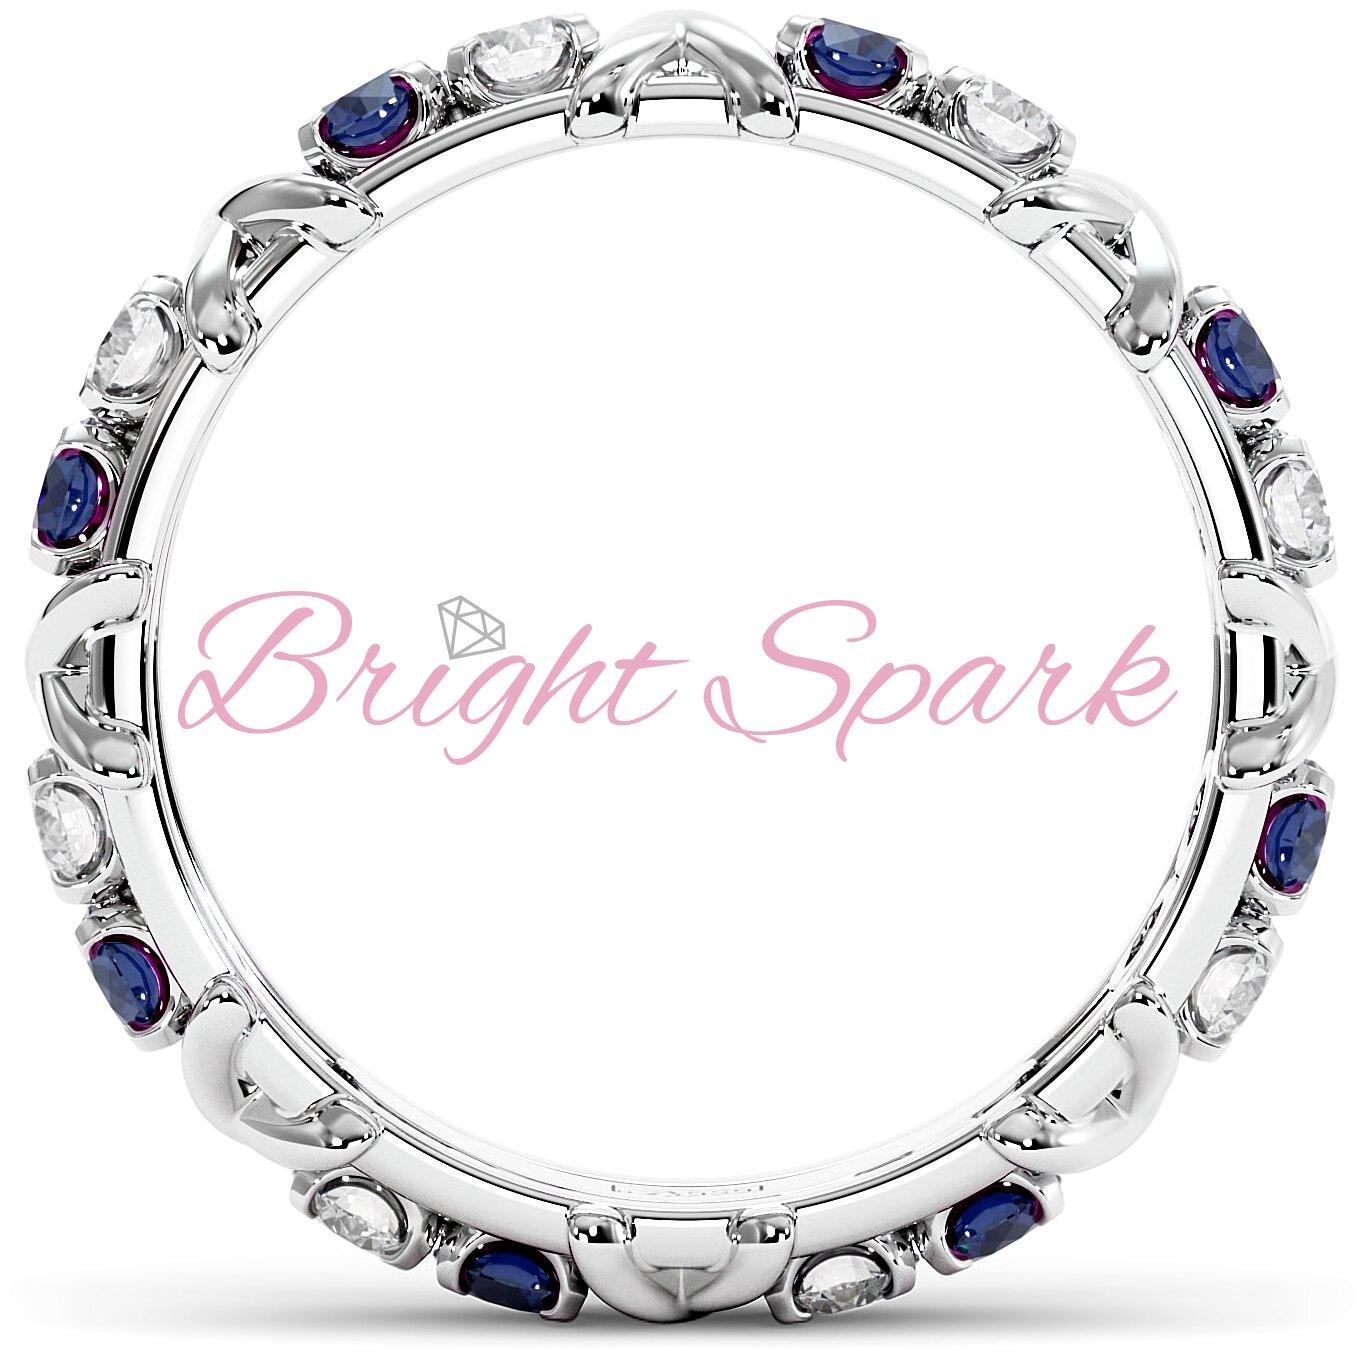 Кольцо с иксами  и синими сапфирами Tiffany Sixteen Stones by Schlumberger